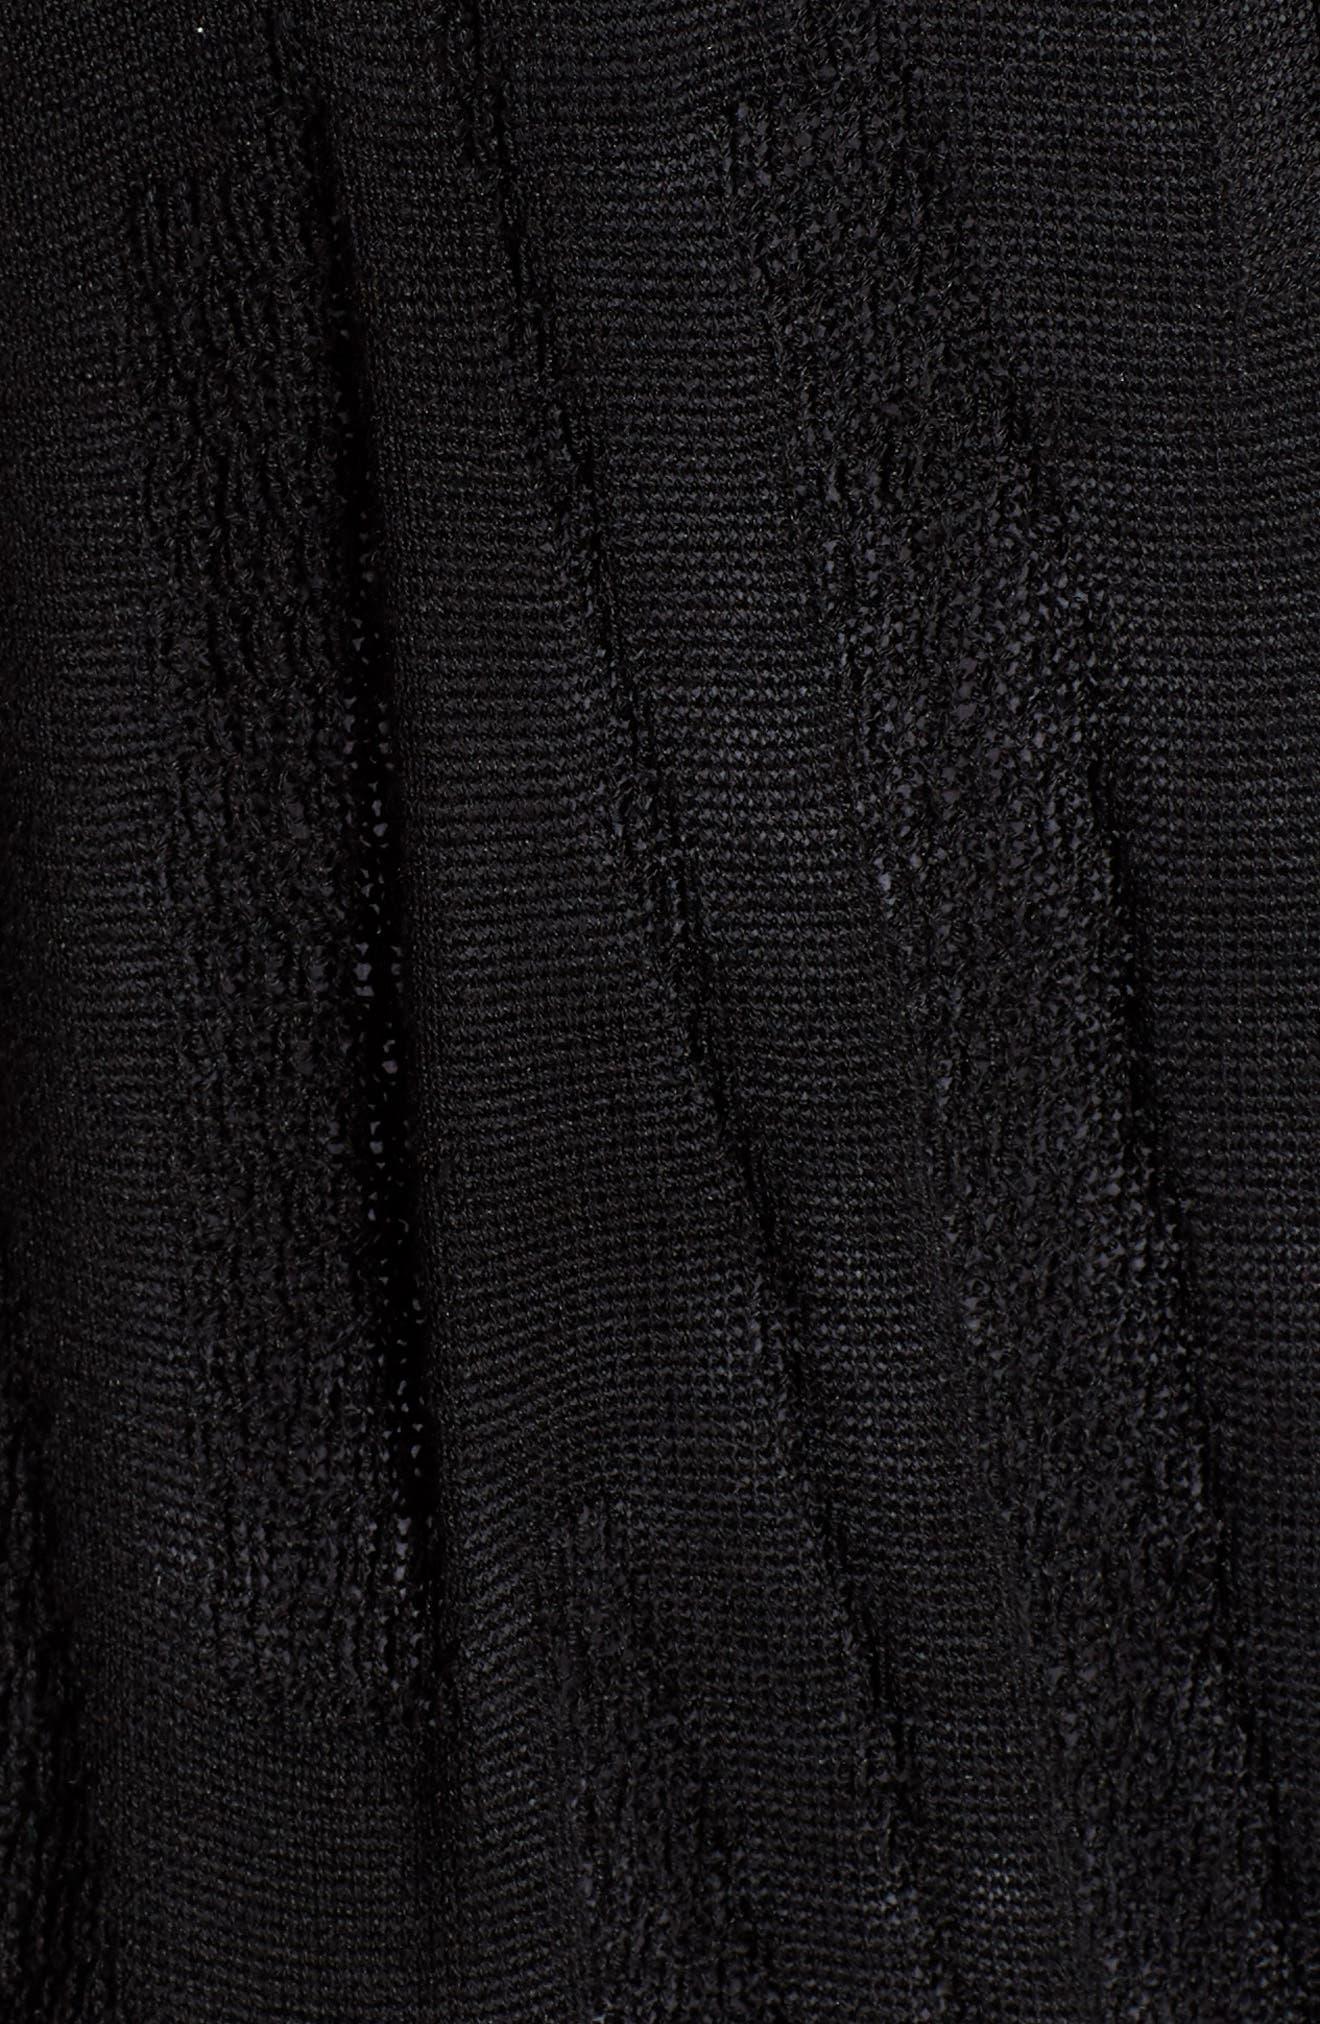 Simple Silk & Organic Linen Cardigan,                             Alternate thumbnail 5, color,                             Black